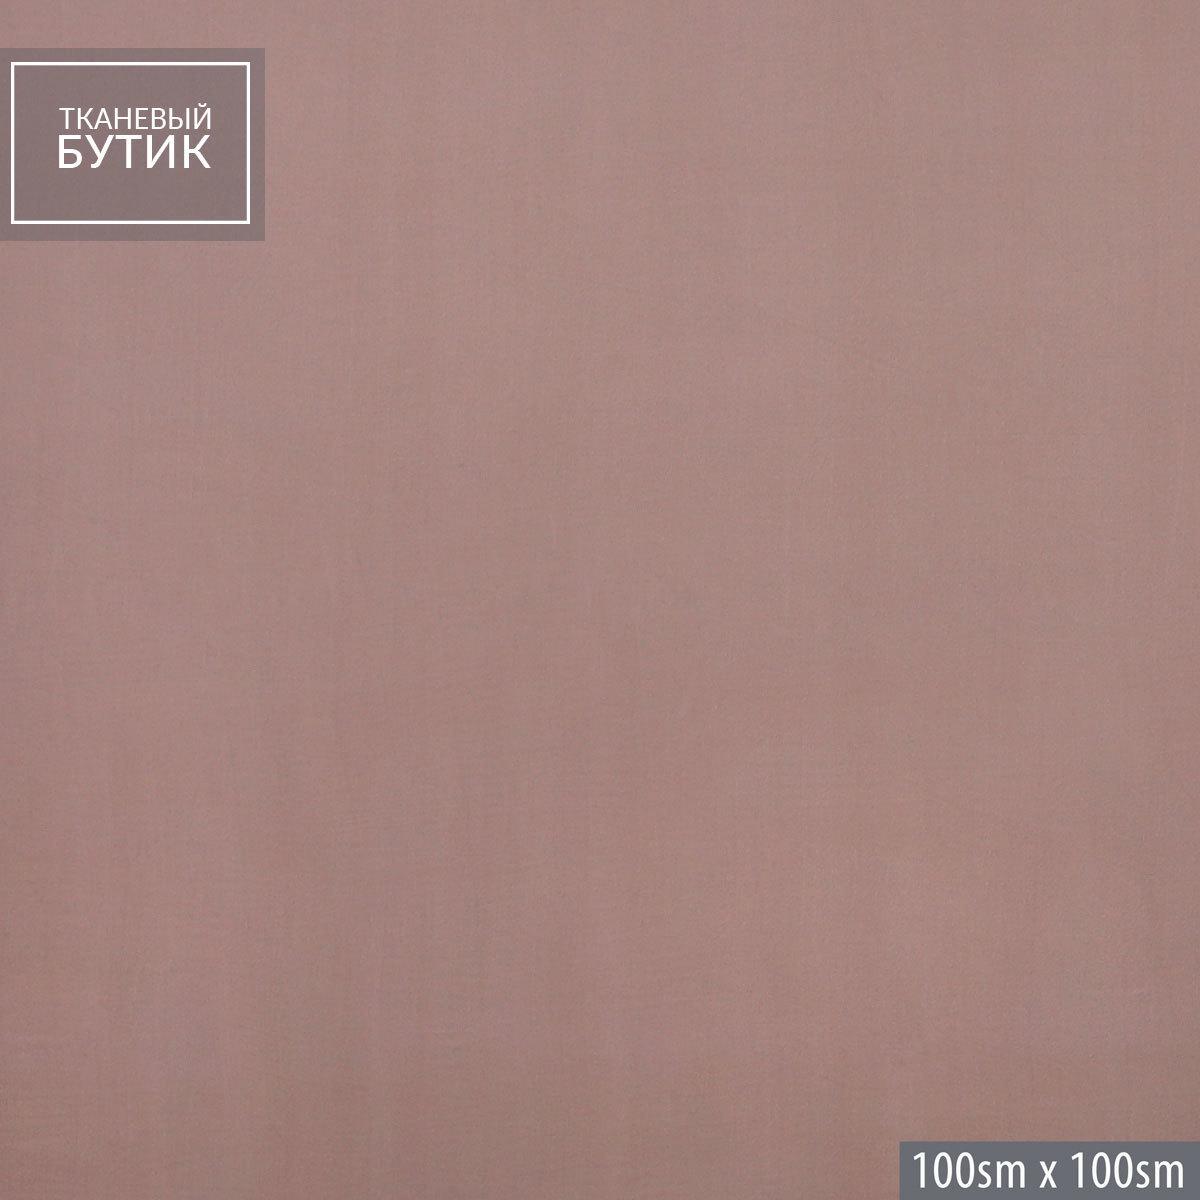 Вискозно-шелковый пудровый бархат